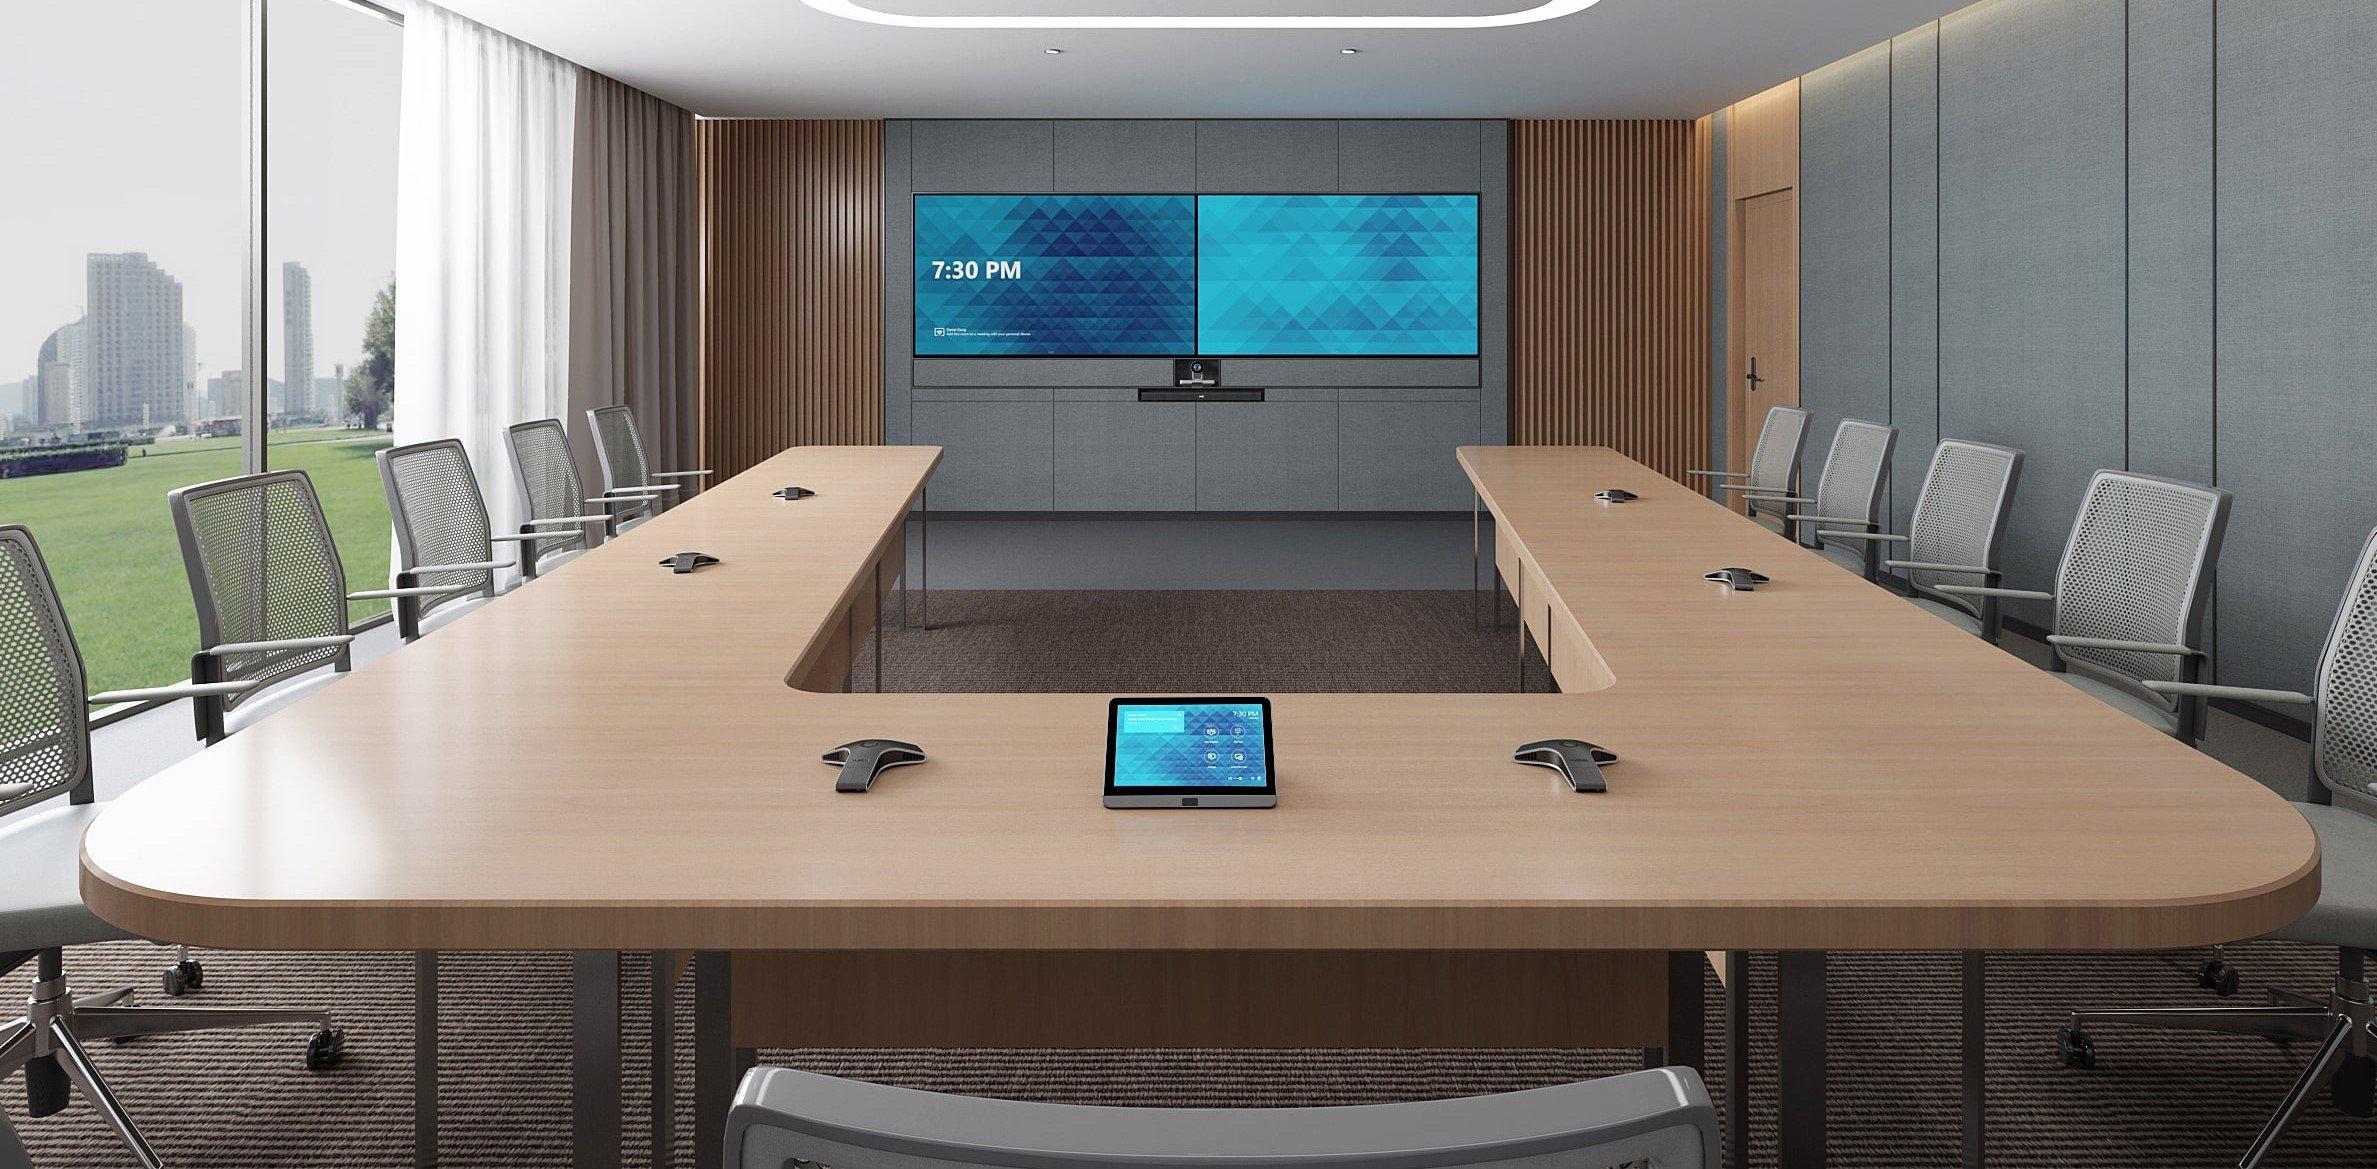 Yealink-MVC800-Microsoft-Teams-Board-Room-Image - Copy